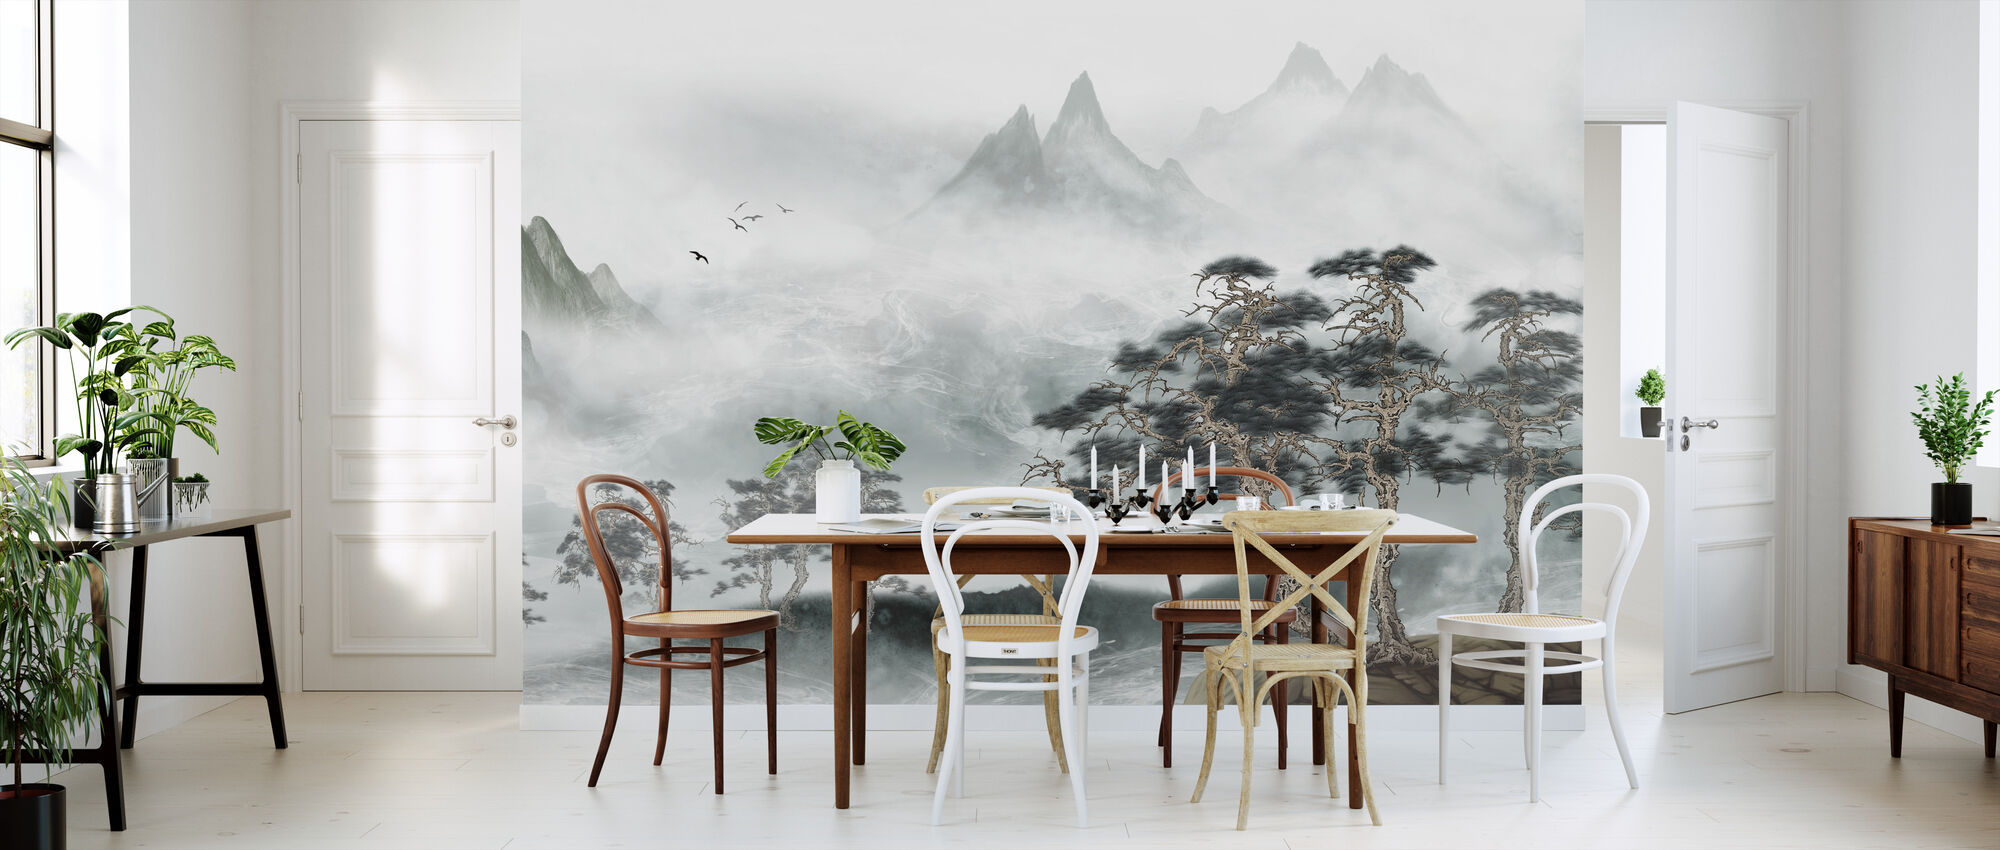 Misty Landscape - Wallpaper - Kitchen